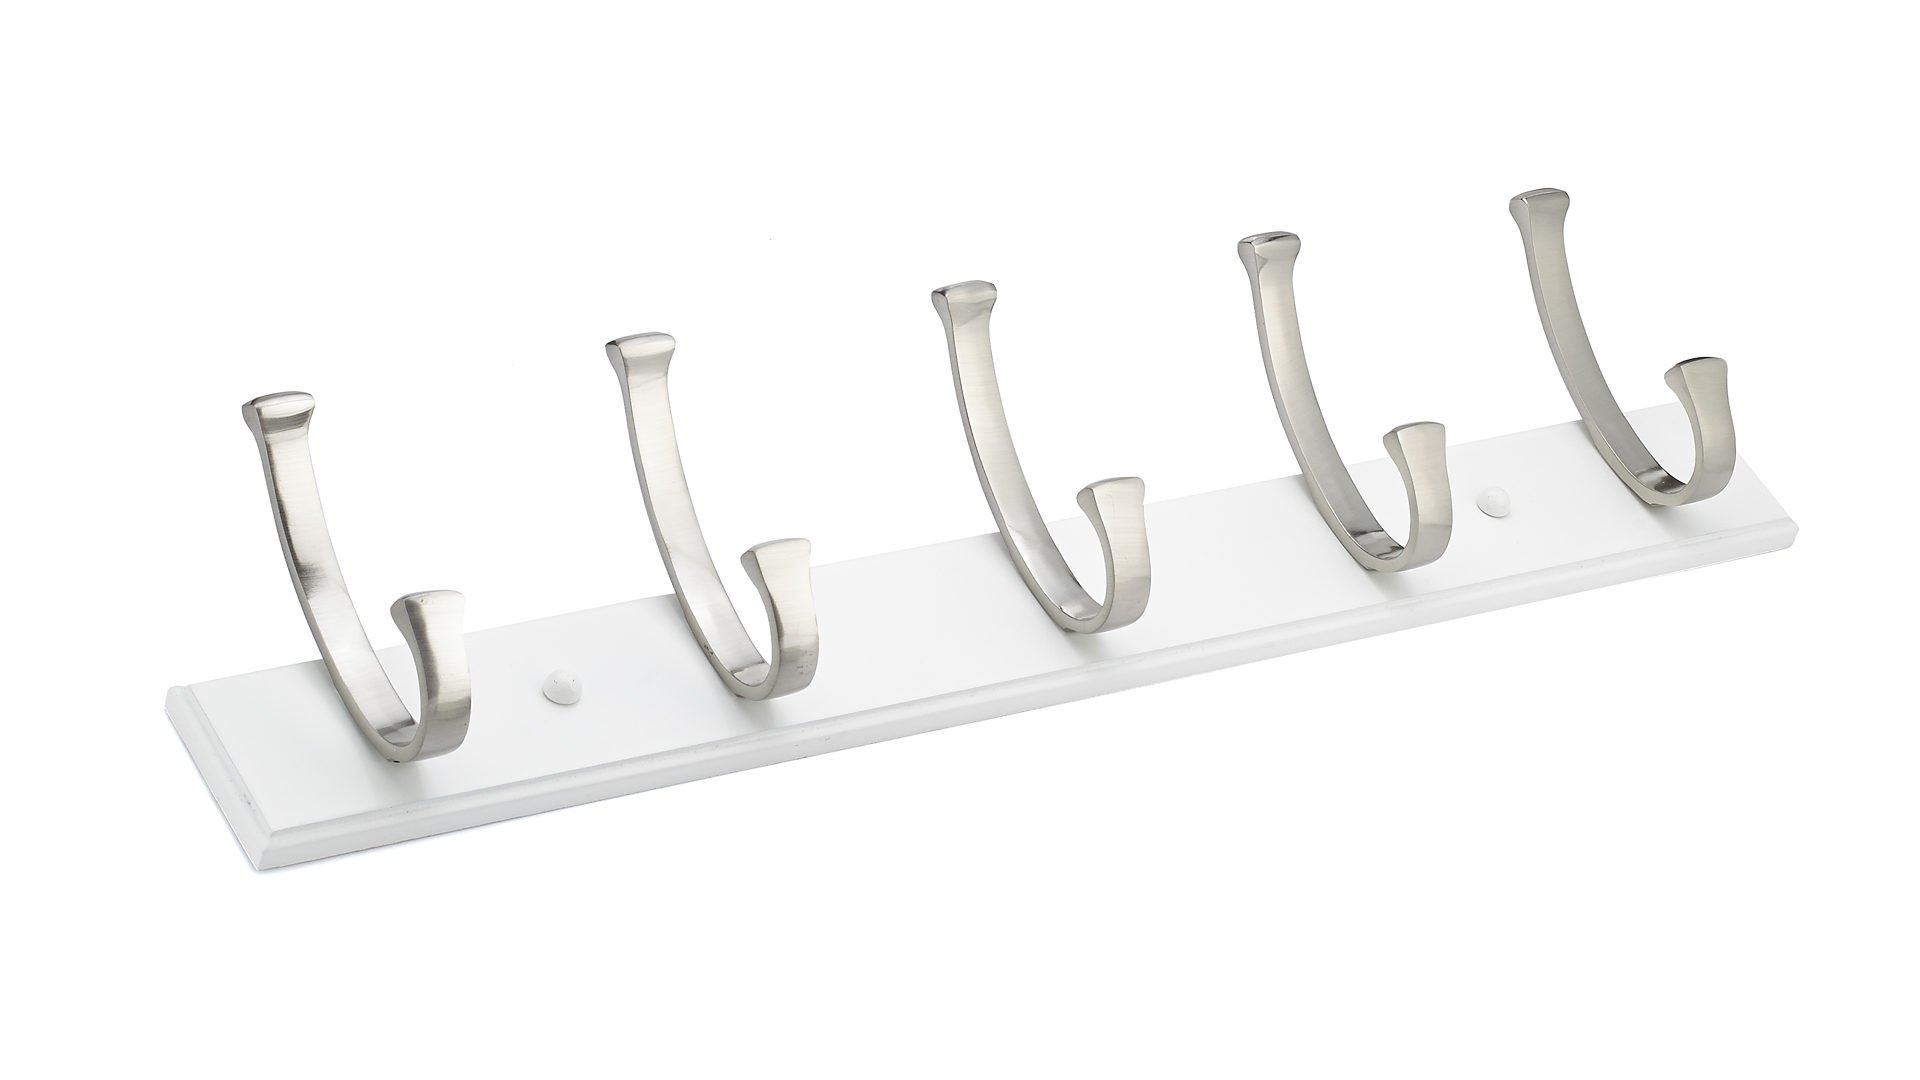 Richelieu RH111211530195 Contemporary Hook Rack, Brushed Nickel/White Finish